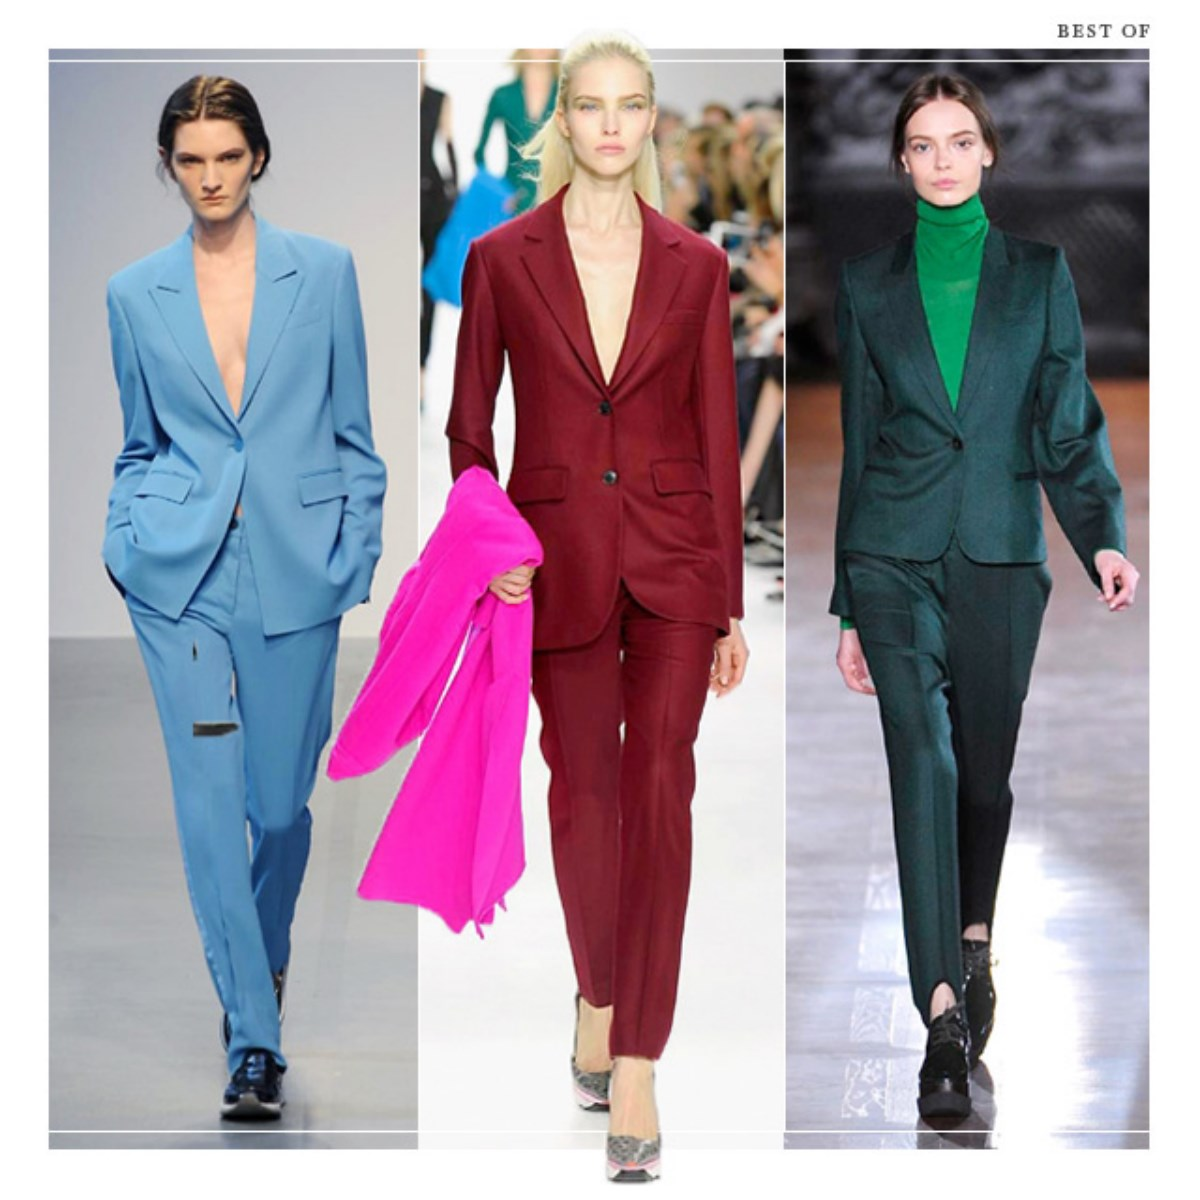 moda-tailleur-monocromatico